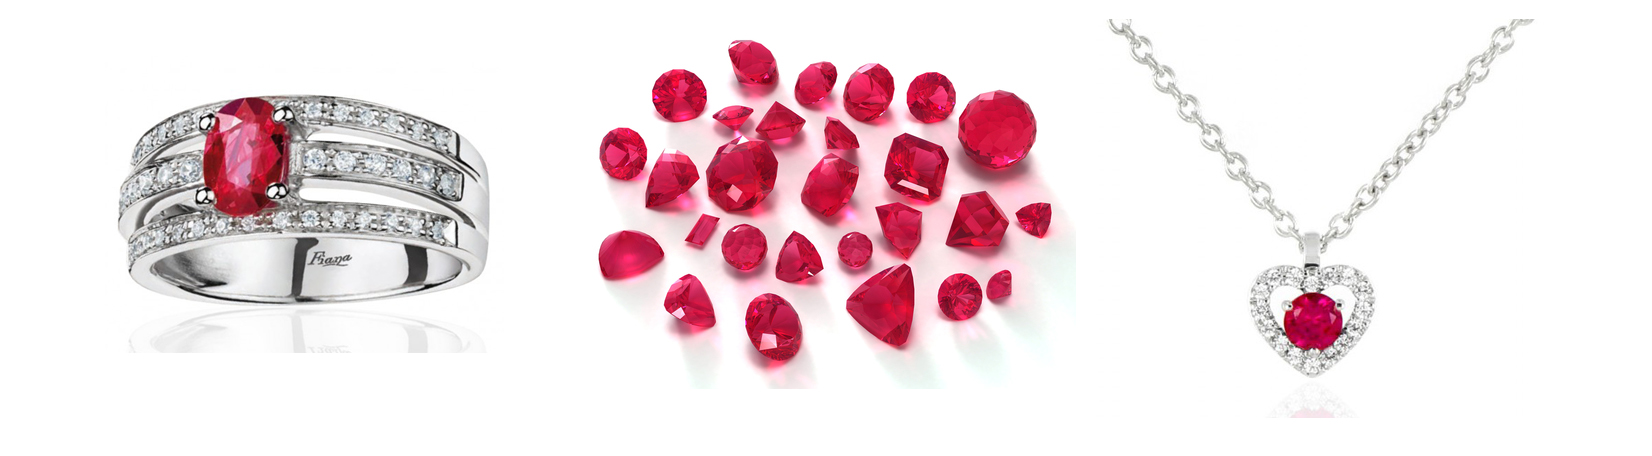 bandeau-bijoux-rubis-ebijouterie